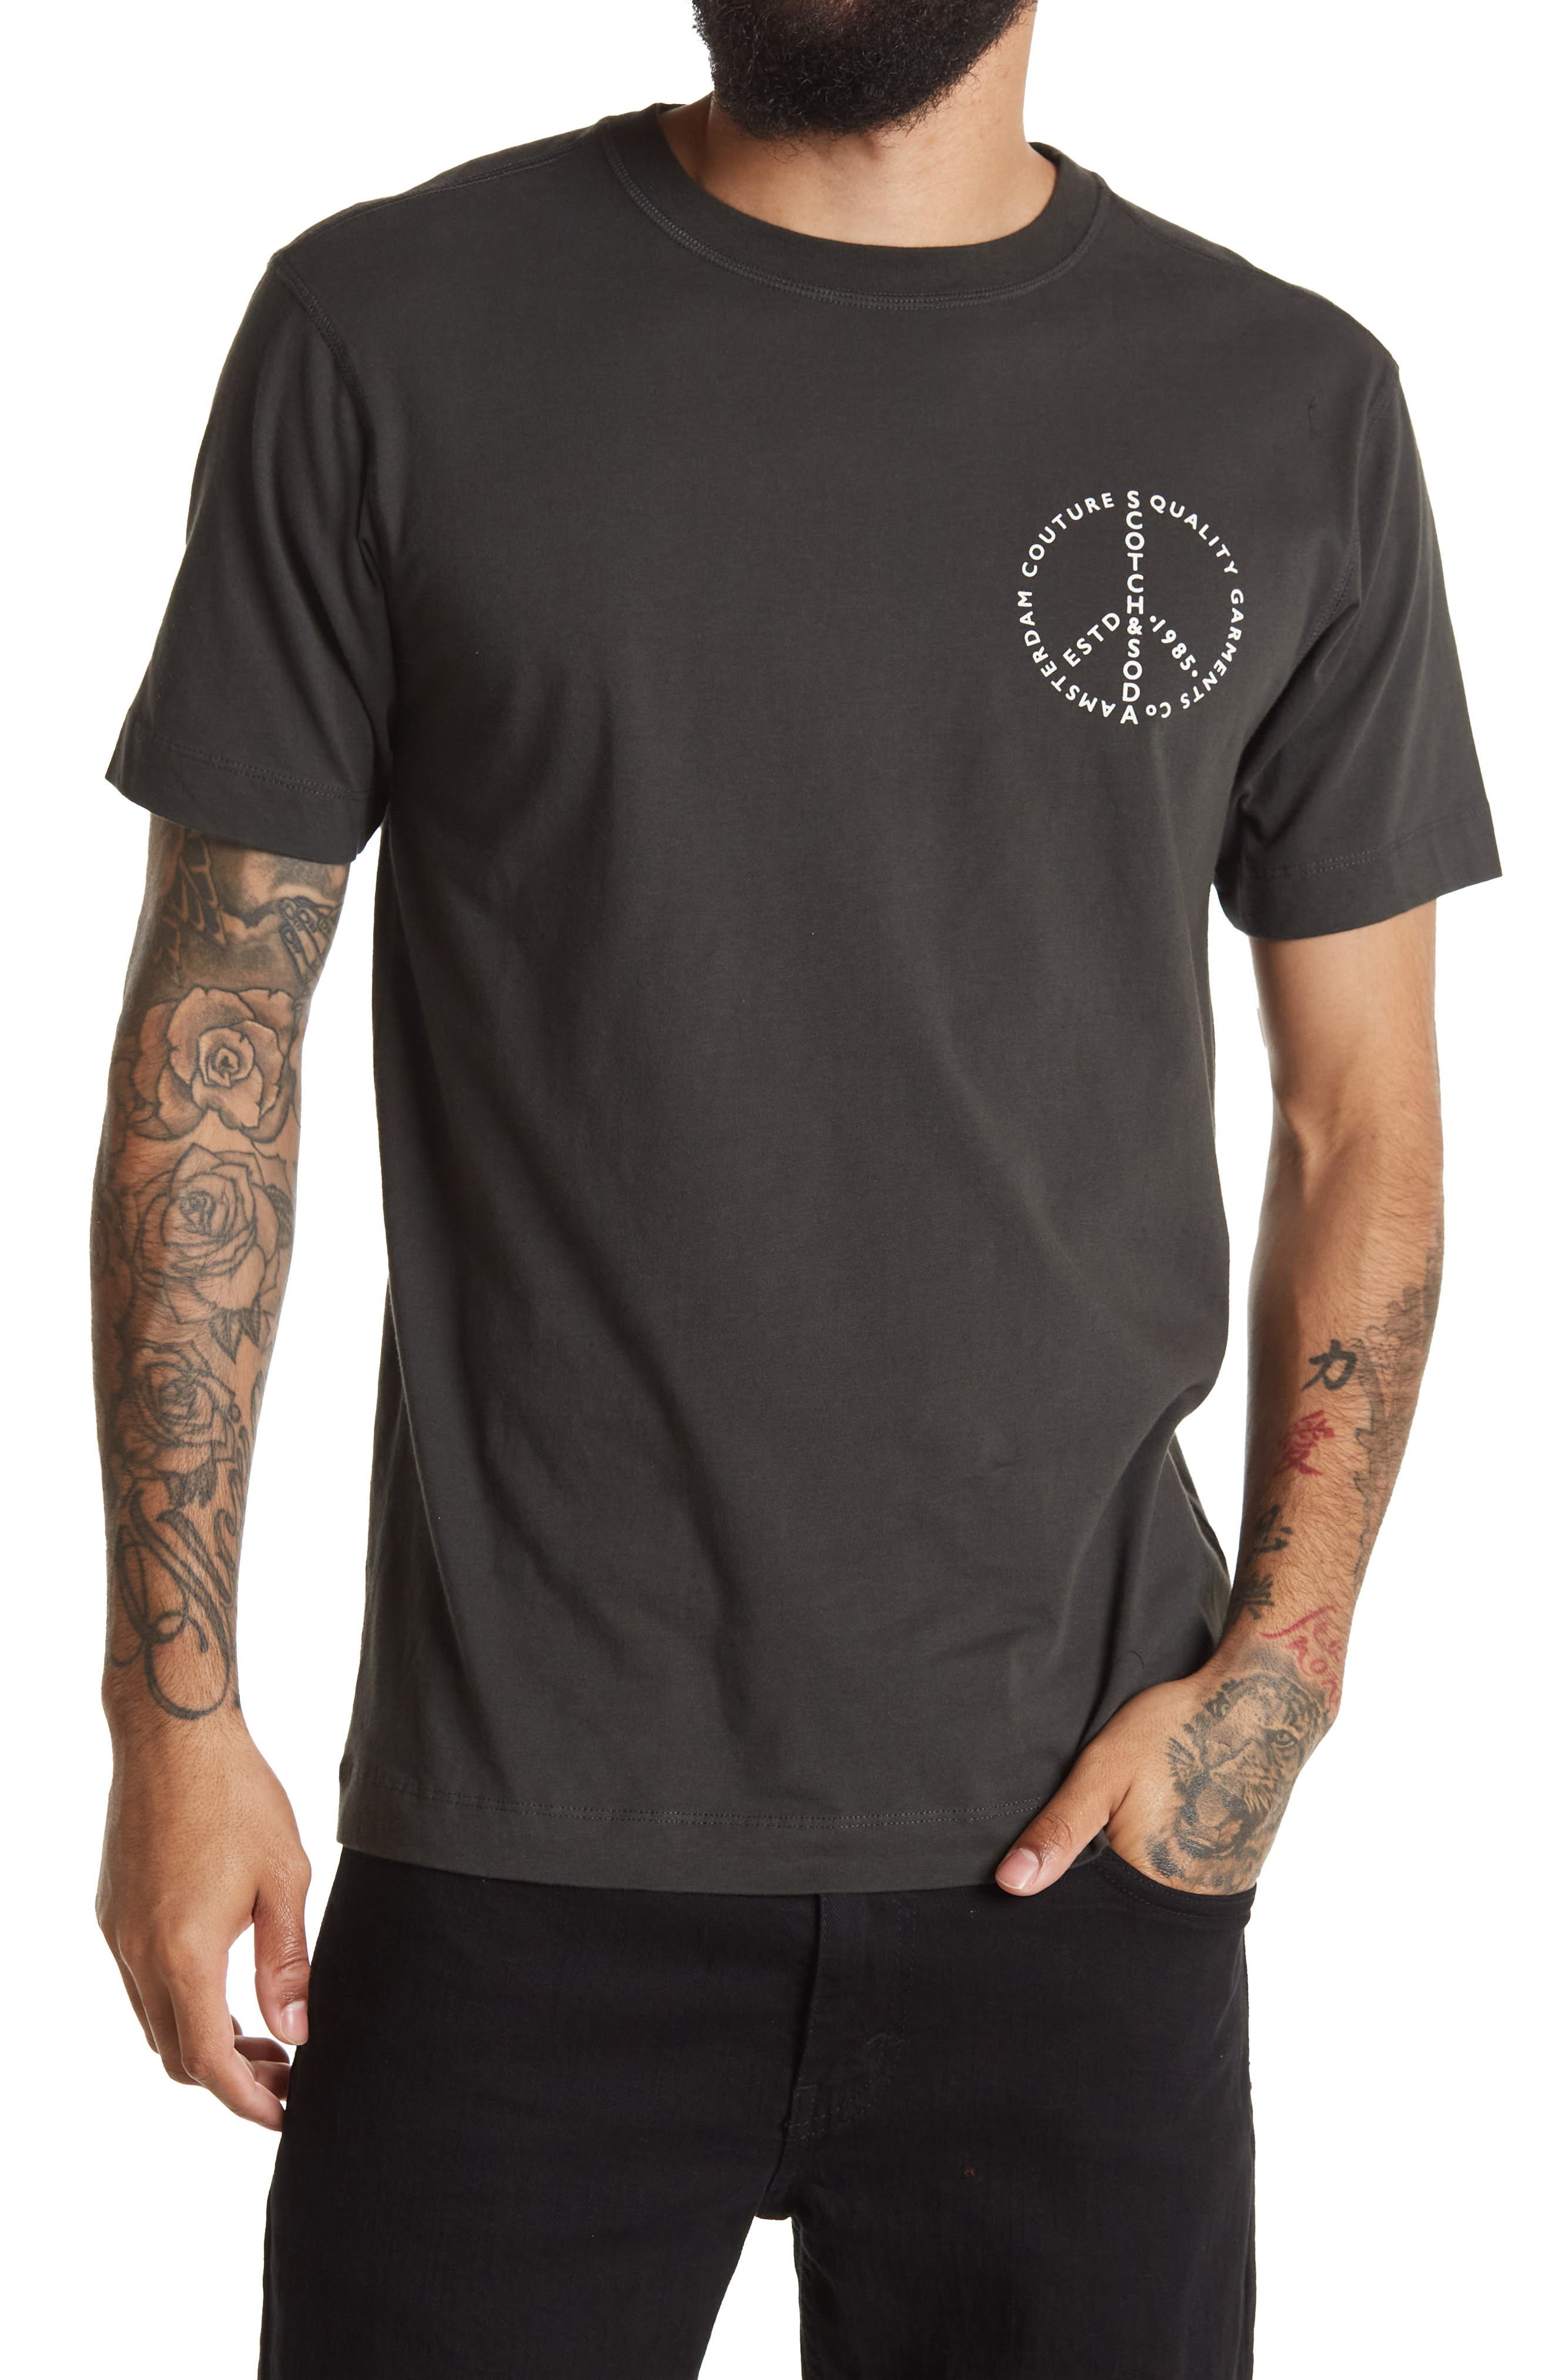 Image of Scotch & Soda Graphic Crew Neck T-Shirt